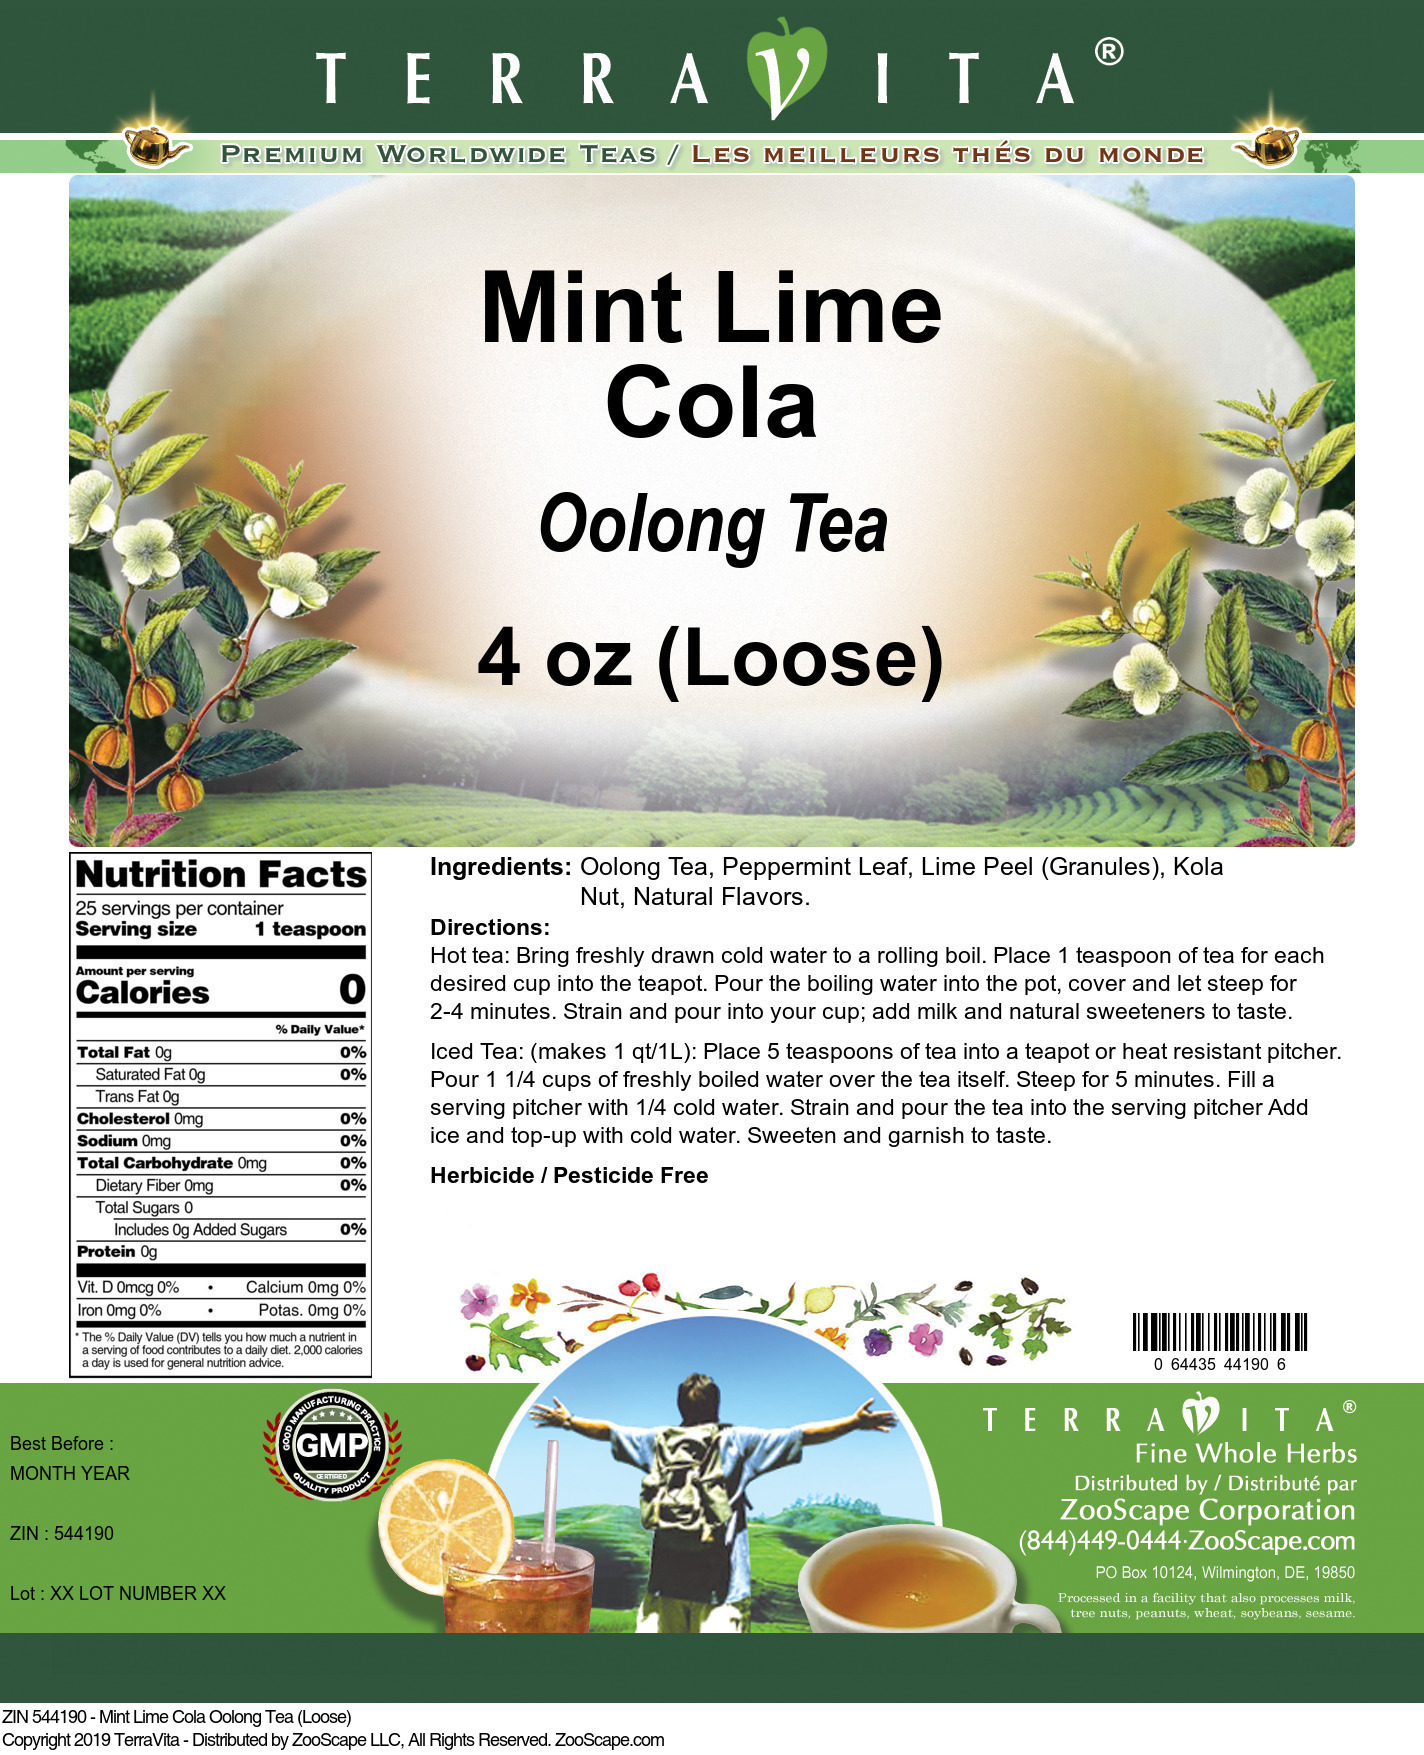 Mint Lime Cola Oolong Tea (Loose)